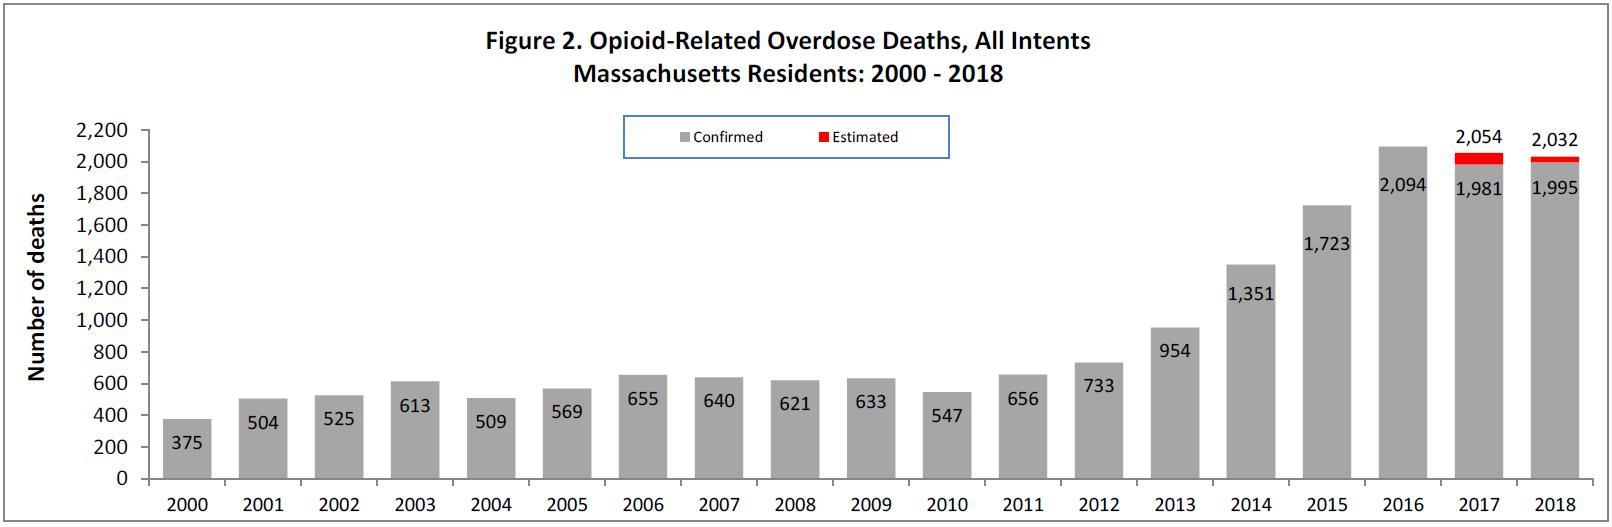 MA Opioid Death 2000-2018